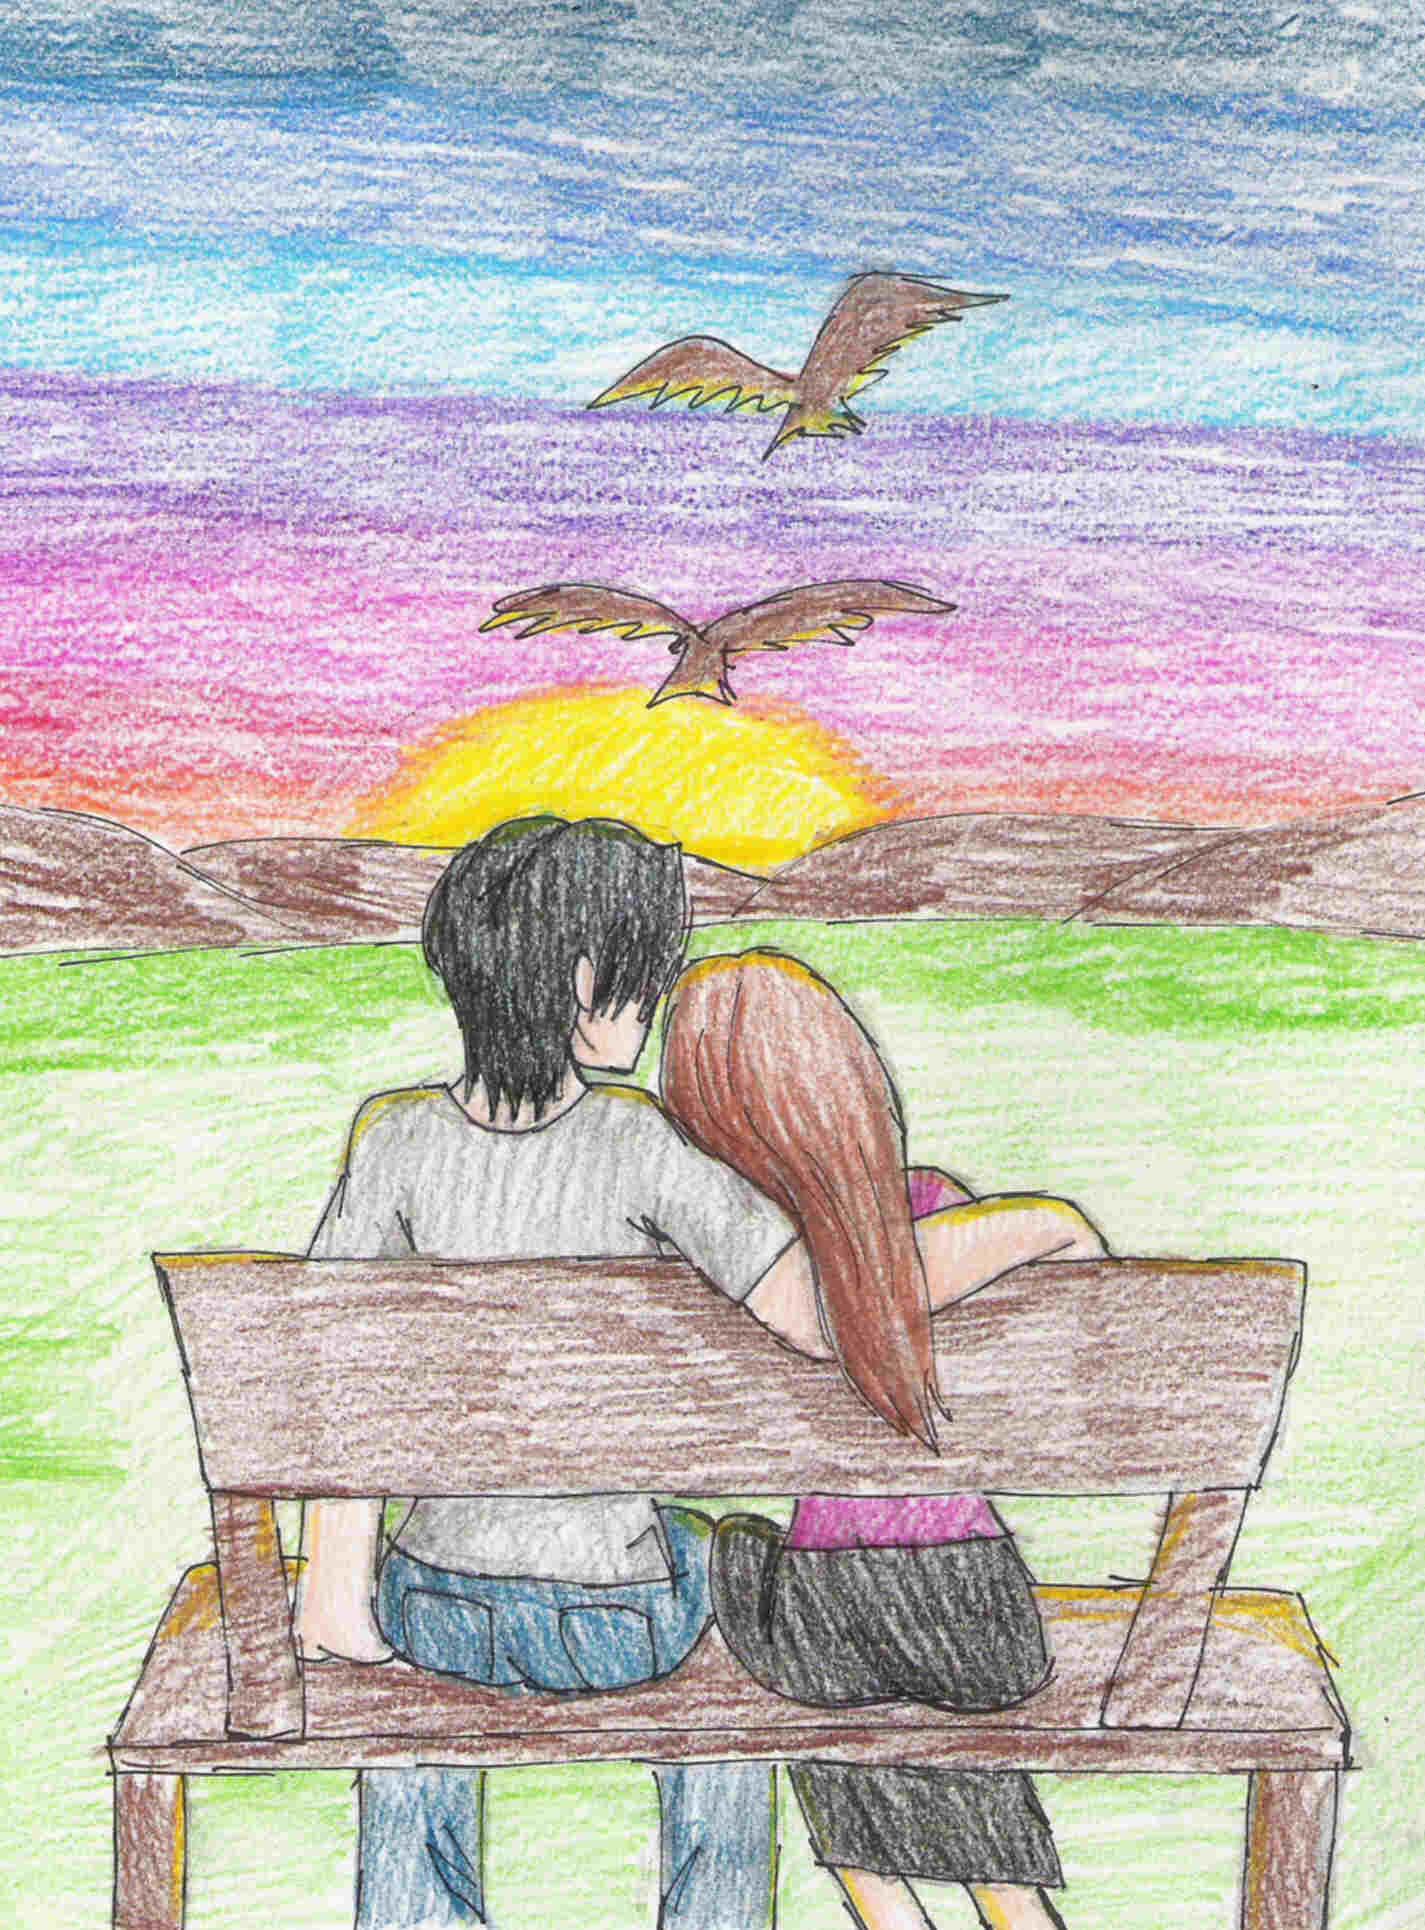 Couple with sunset by Darkfire75 on DeviantArt